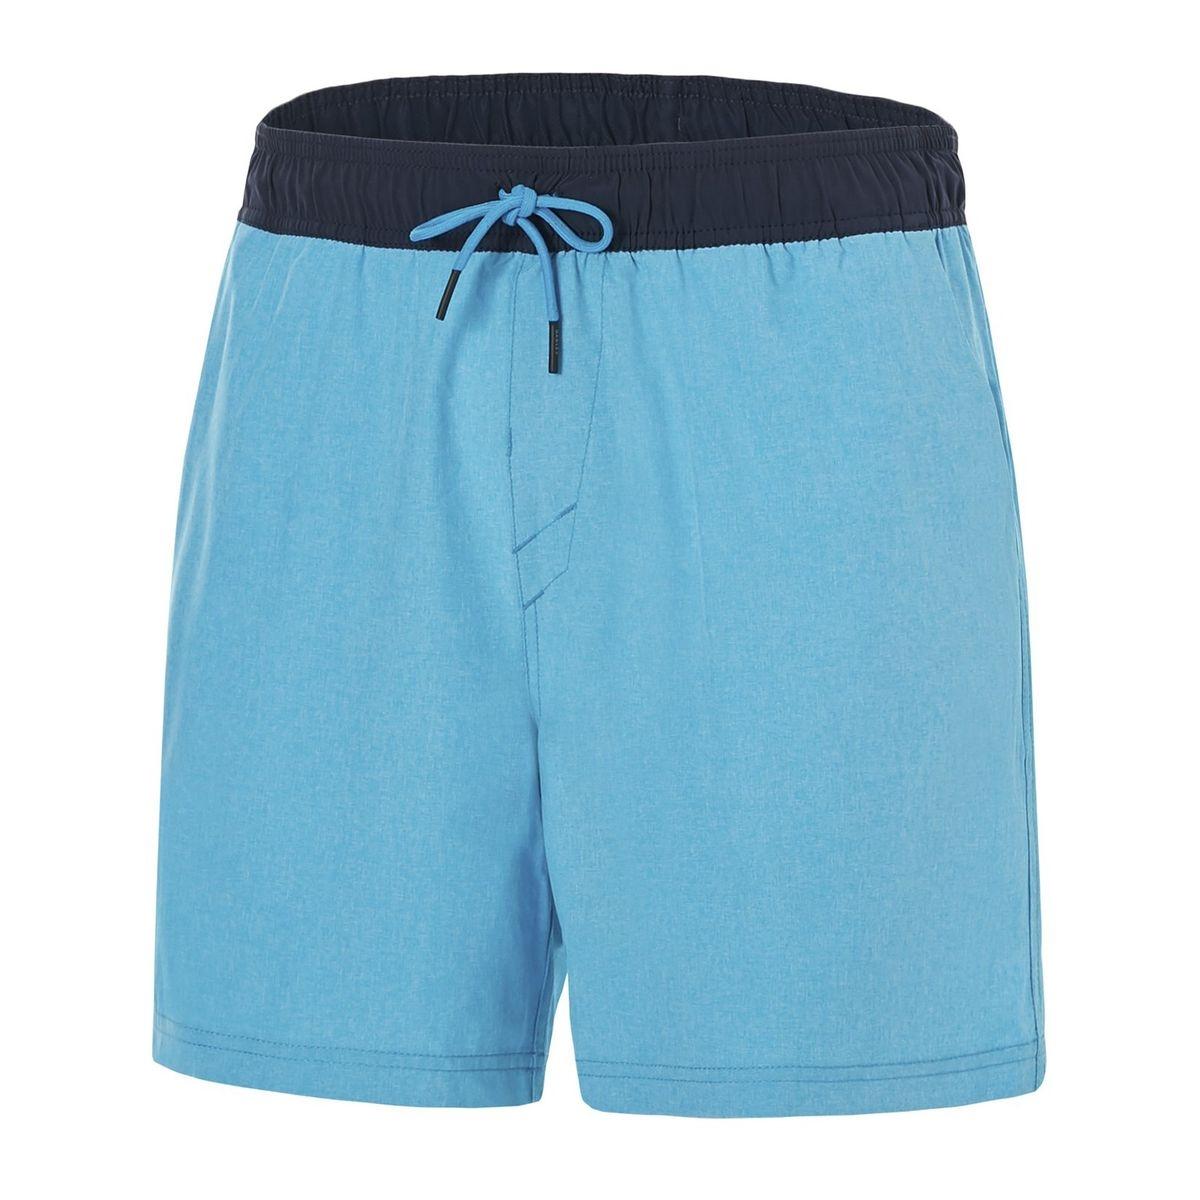 Short de Bain Mark II Volley - 16 Inch